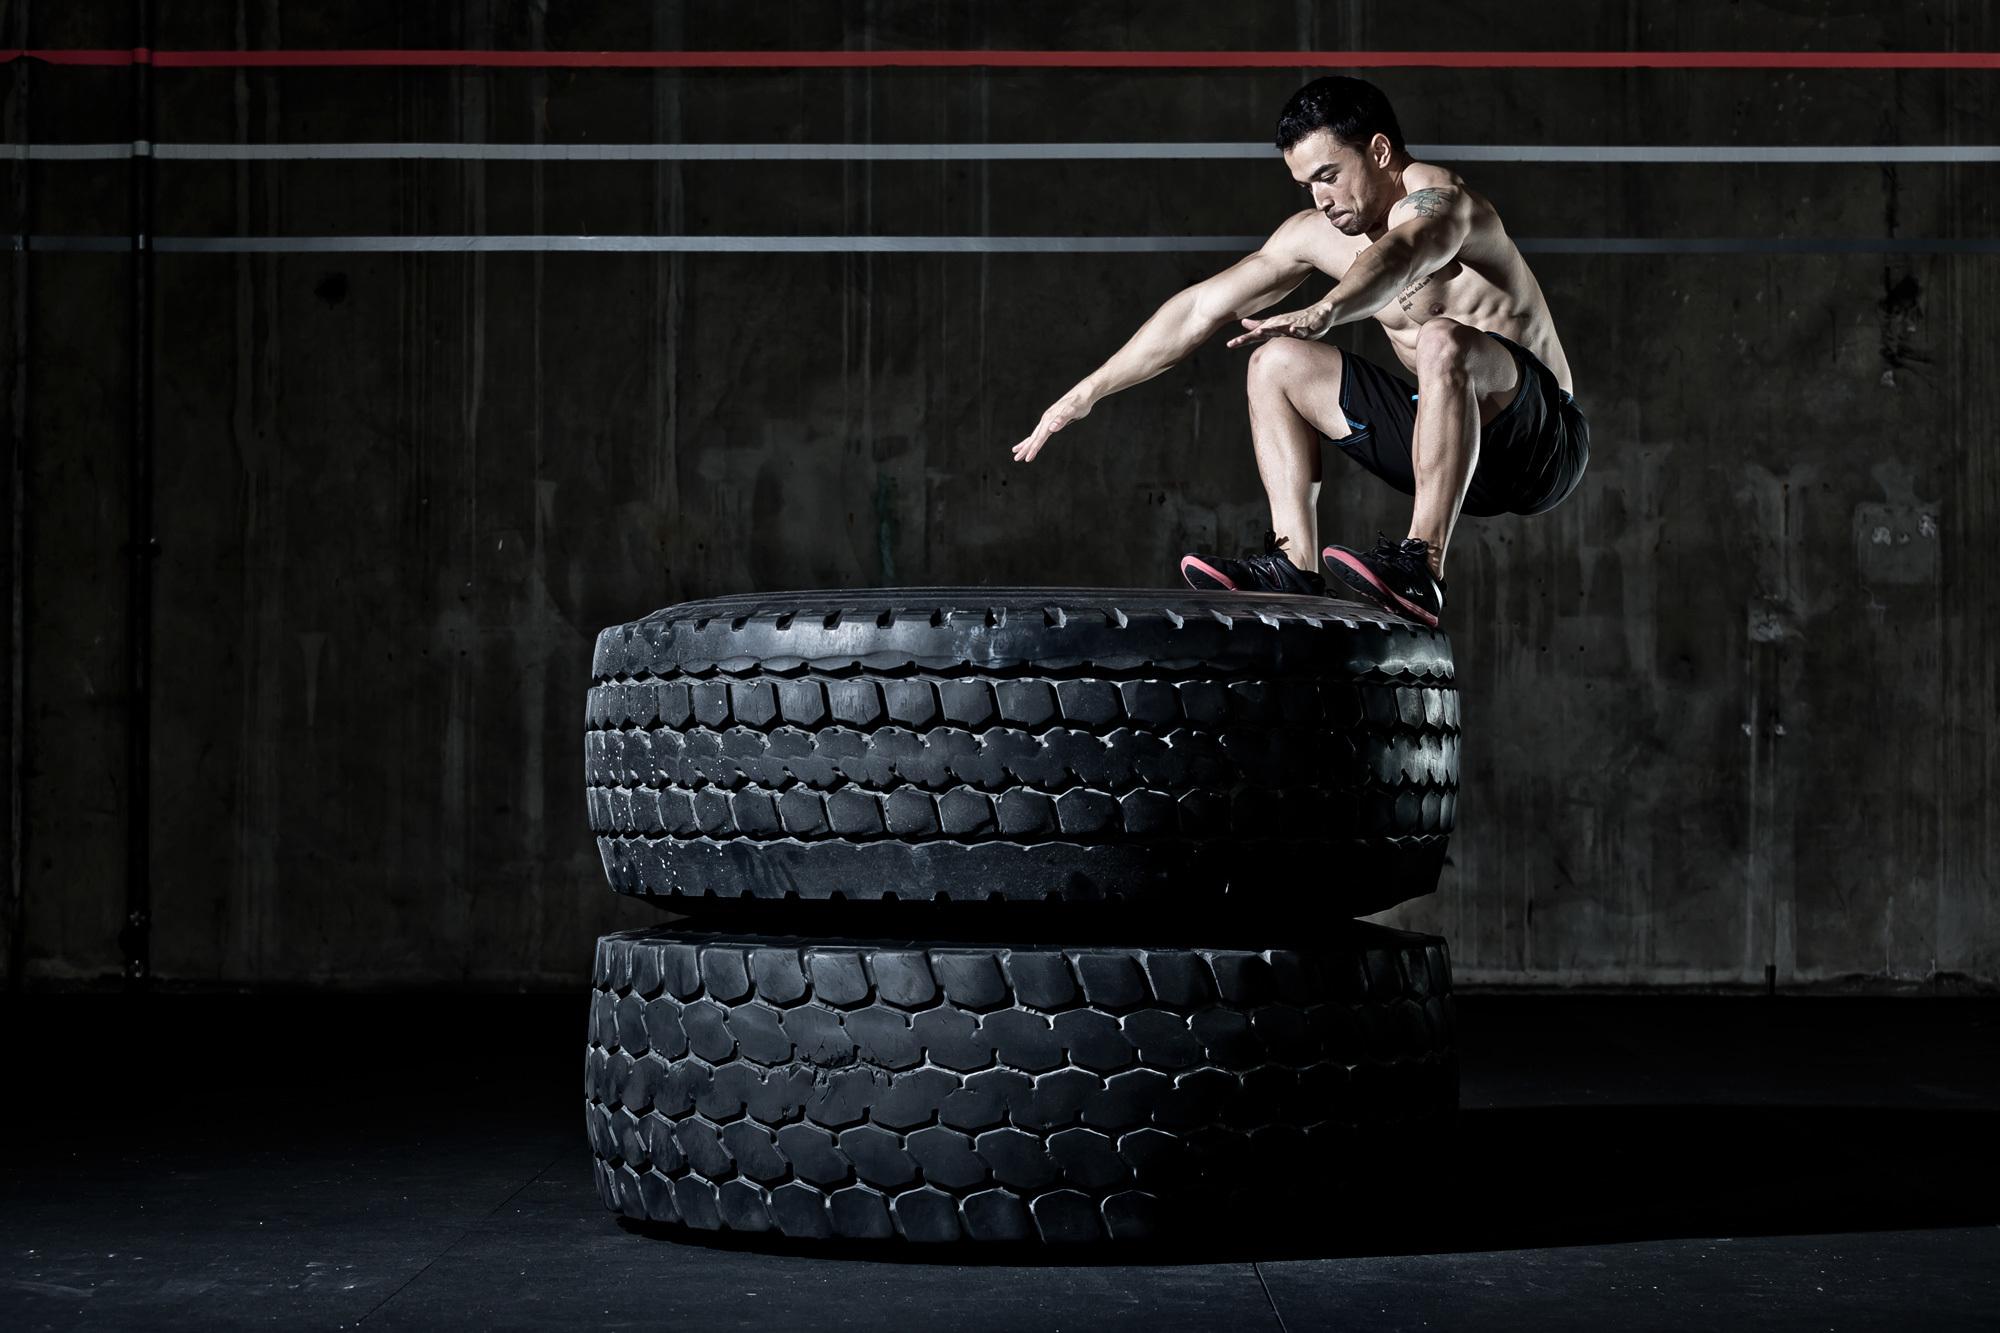 Best 43 CrossFit Wallpaper on HipWallpaper CrossFit Wallpaper 2000x1333